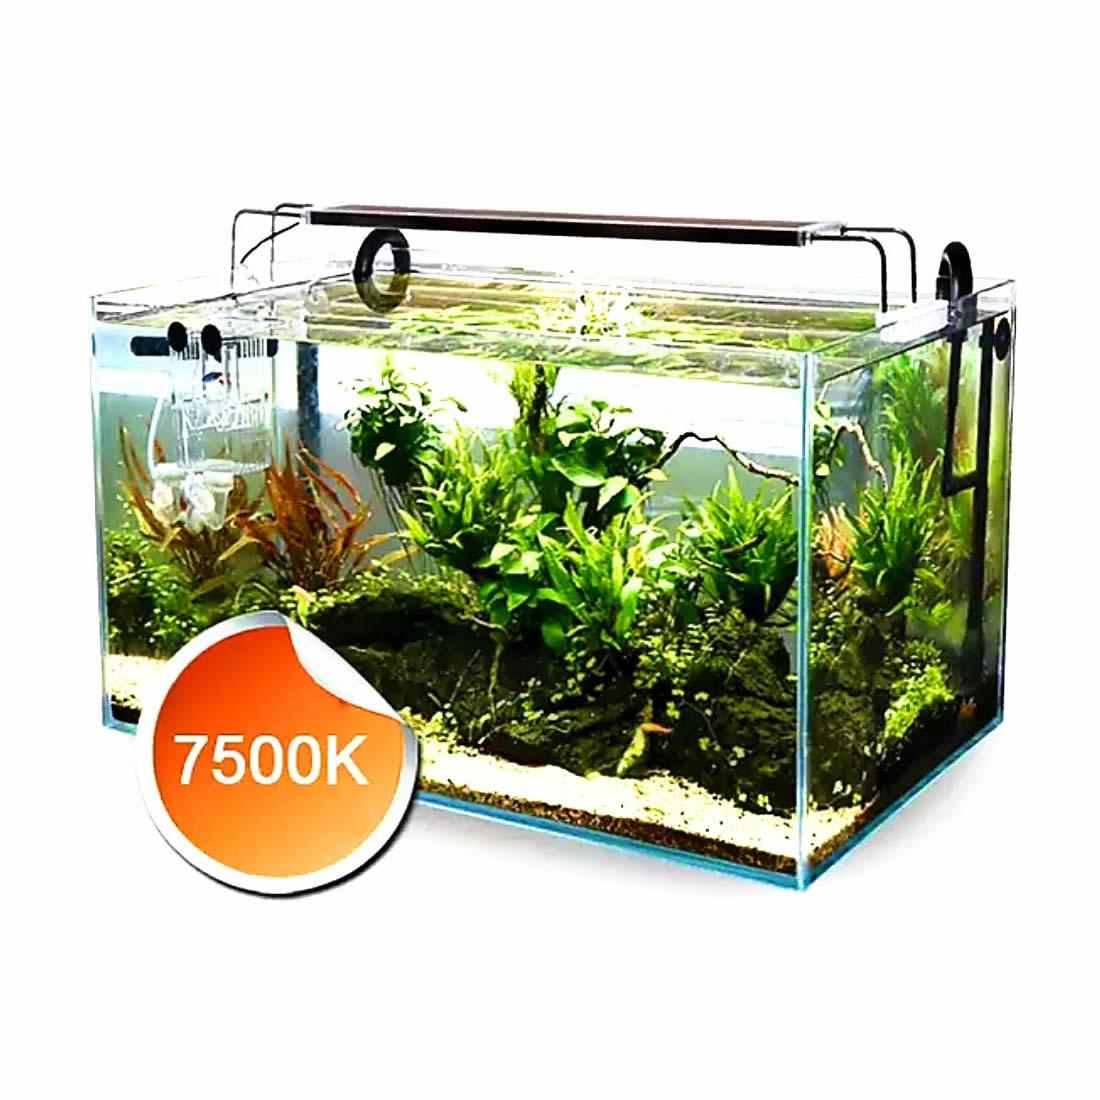 SunSun ADS-900C Aquarium LED Light 60w perfect for 3 Feet FreshWater Tank